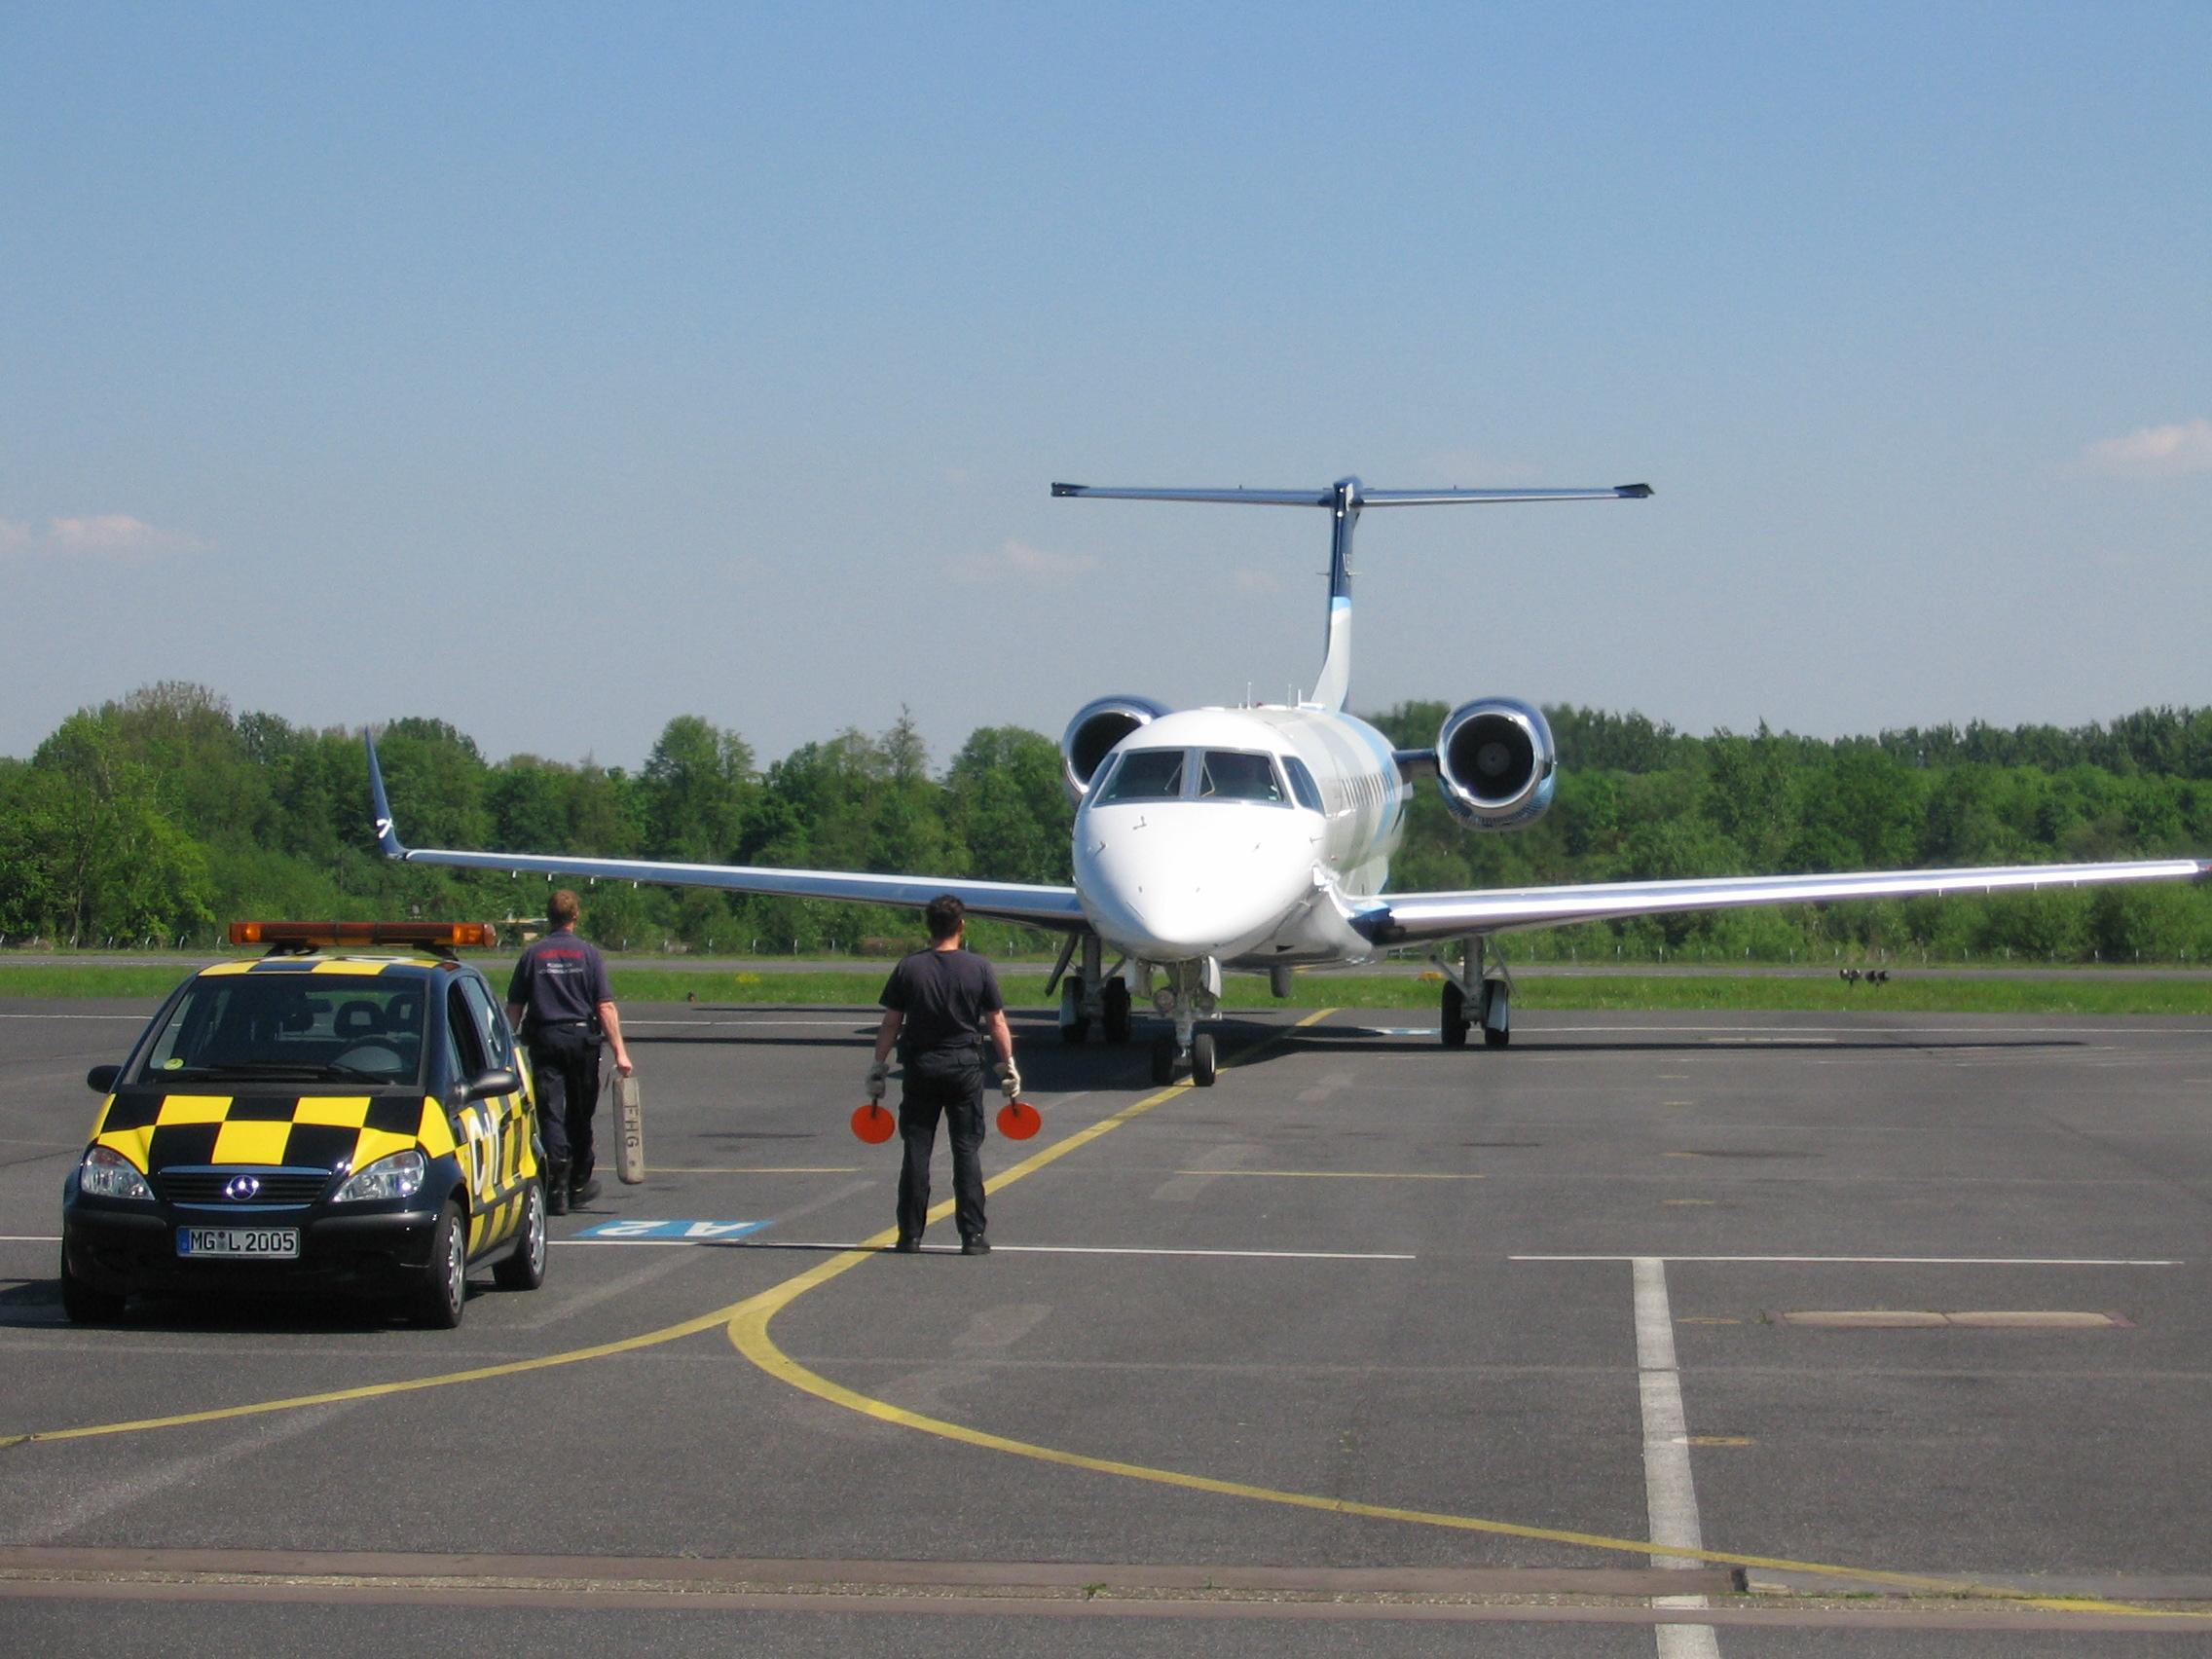 Mönchengladbach Airport